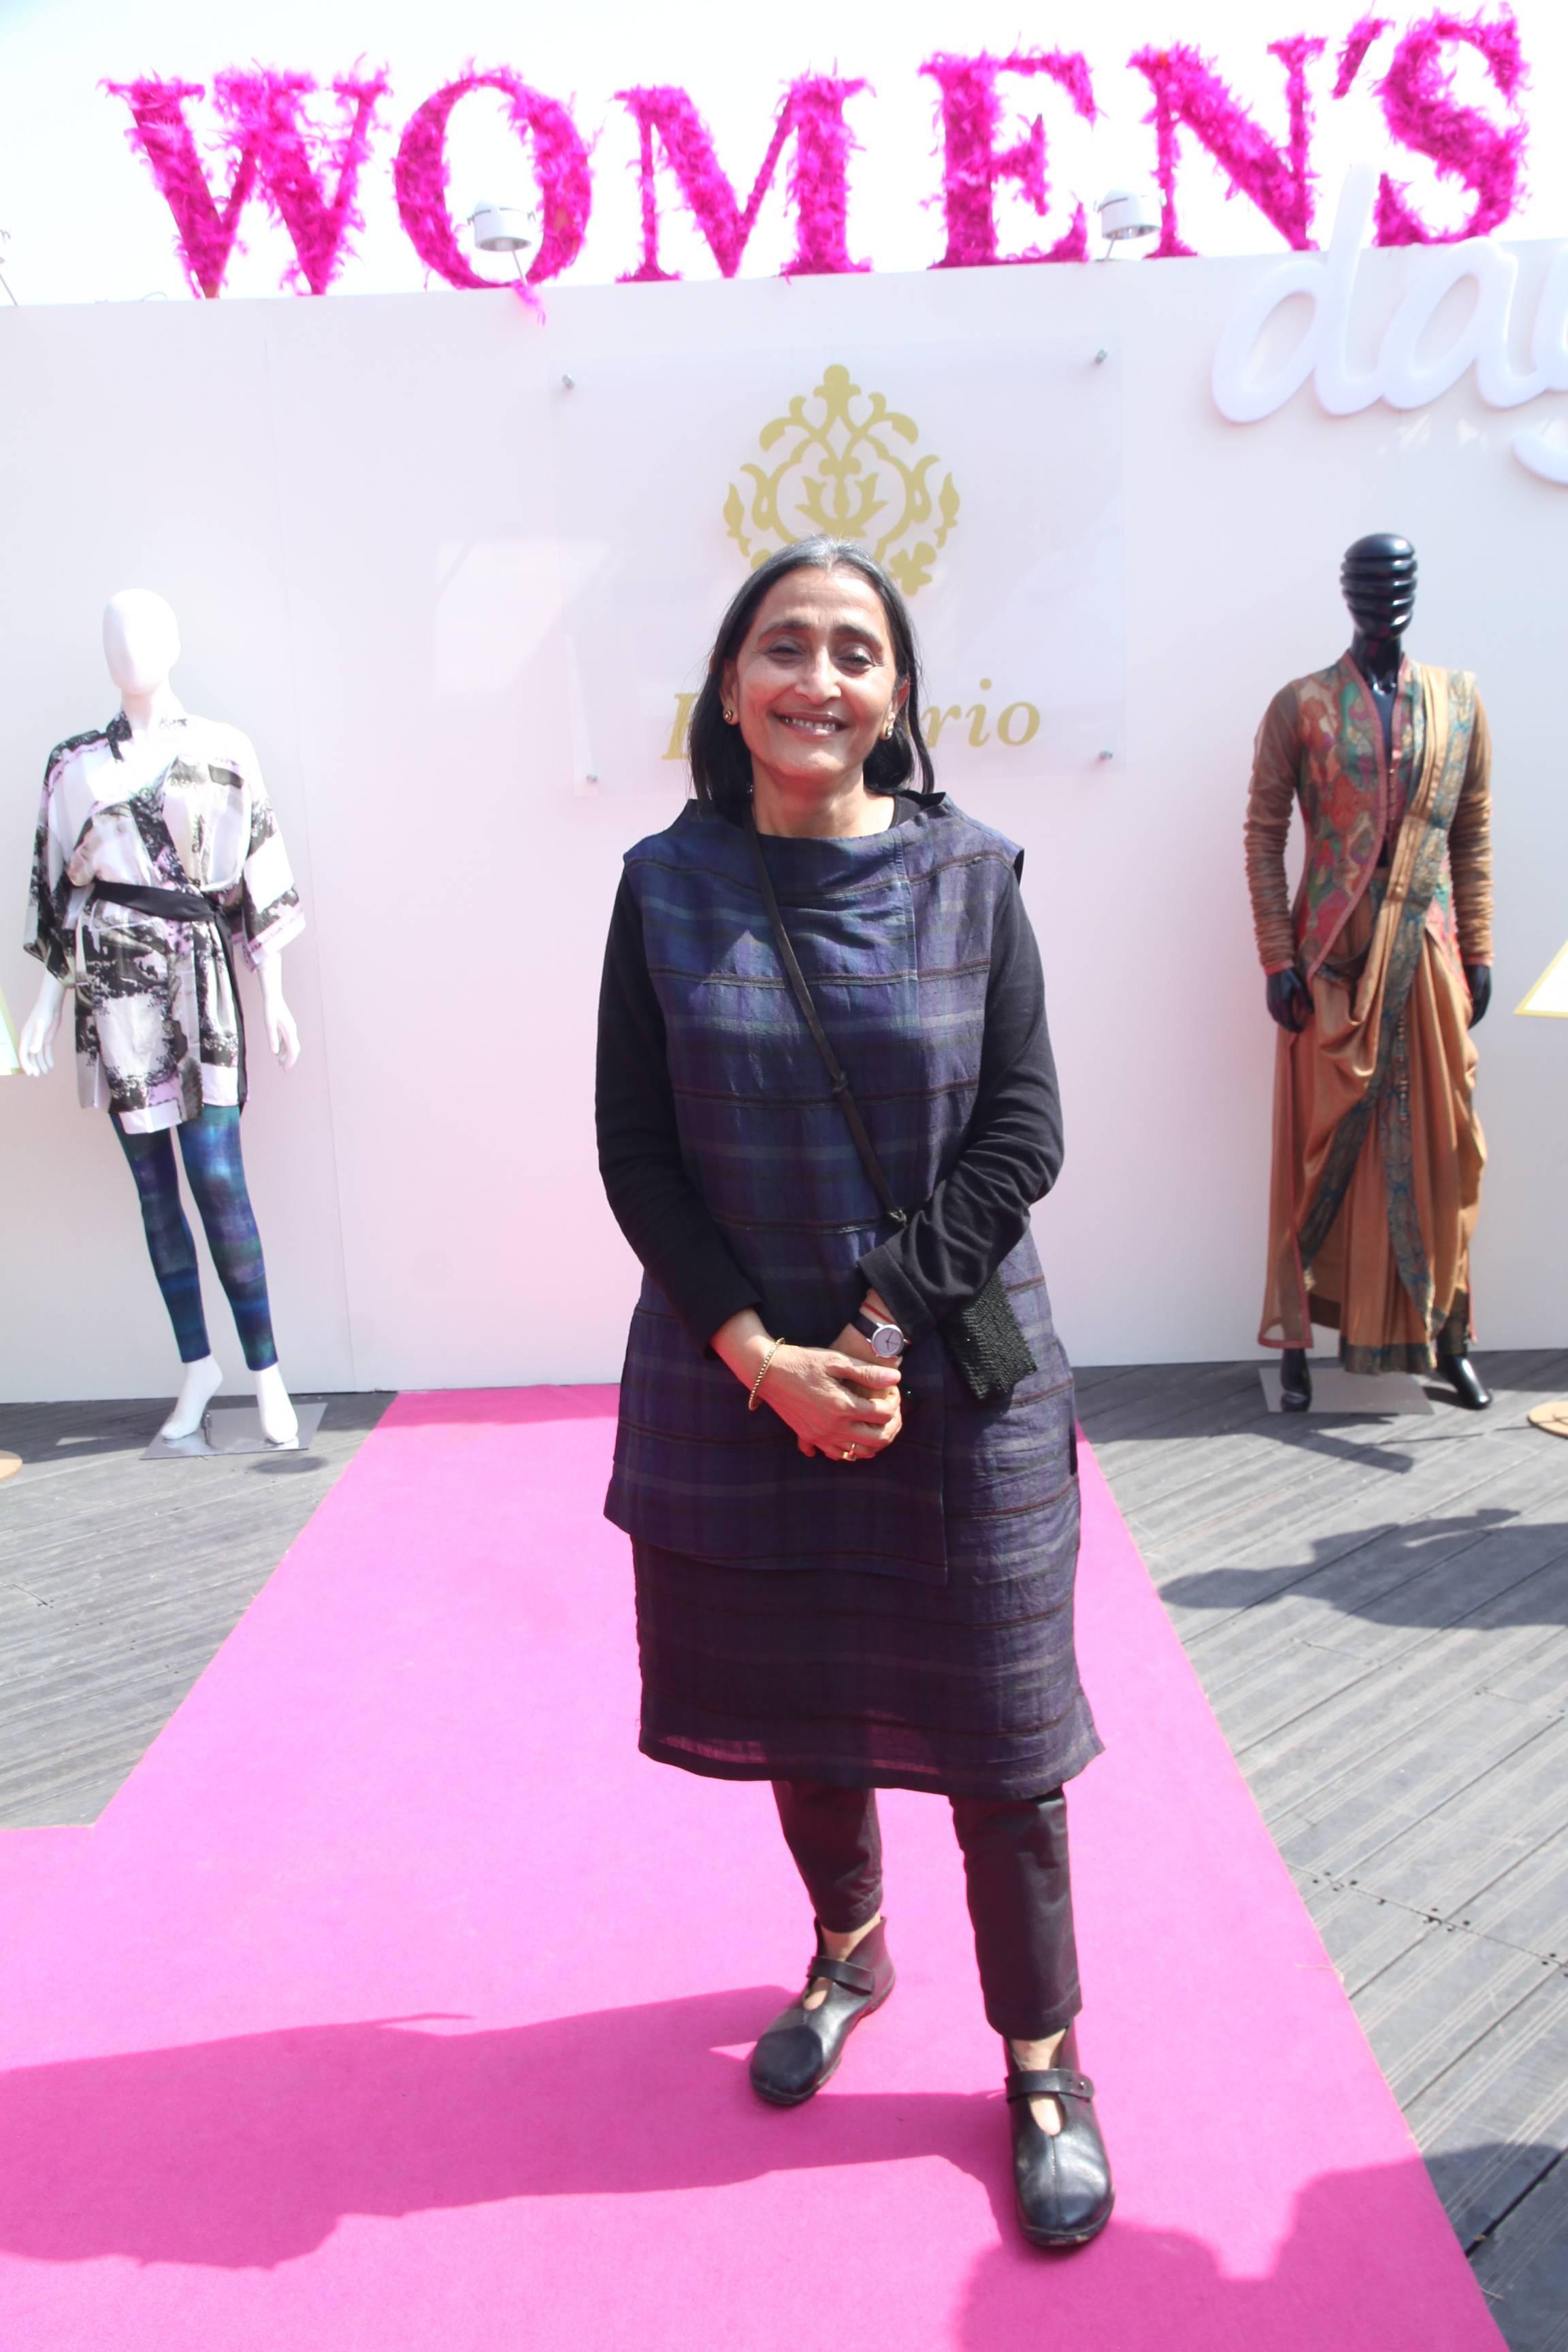 DLF Emporio - Women's Day - Neeru Kumar at the event.jpg